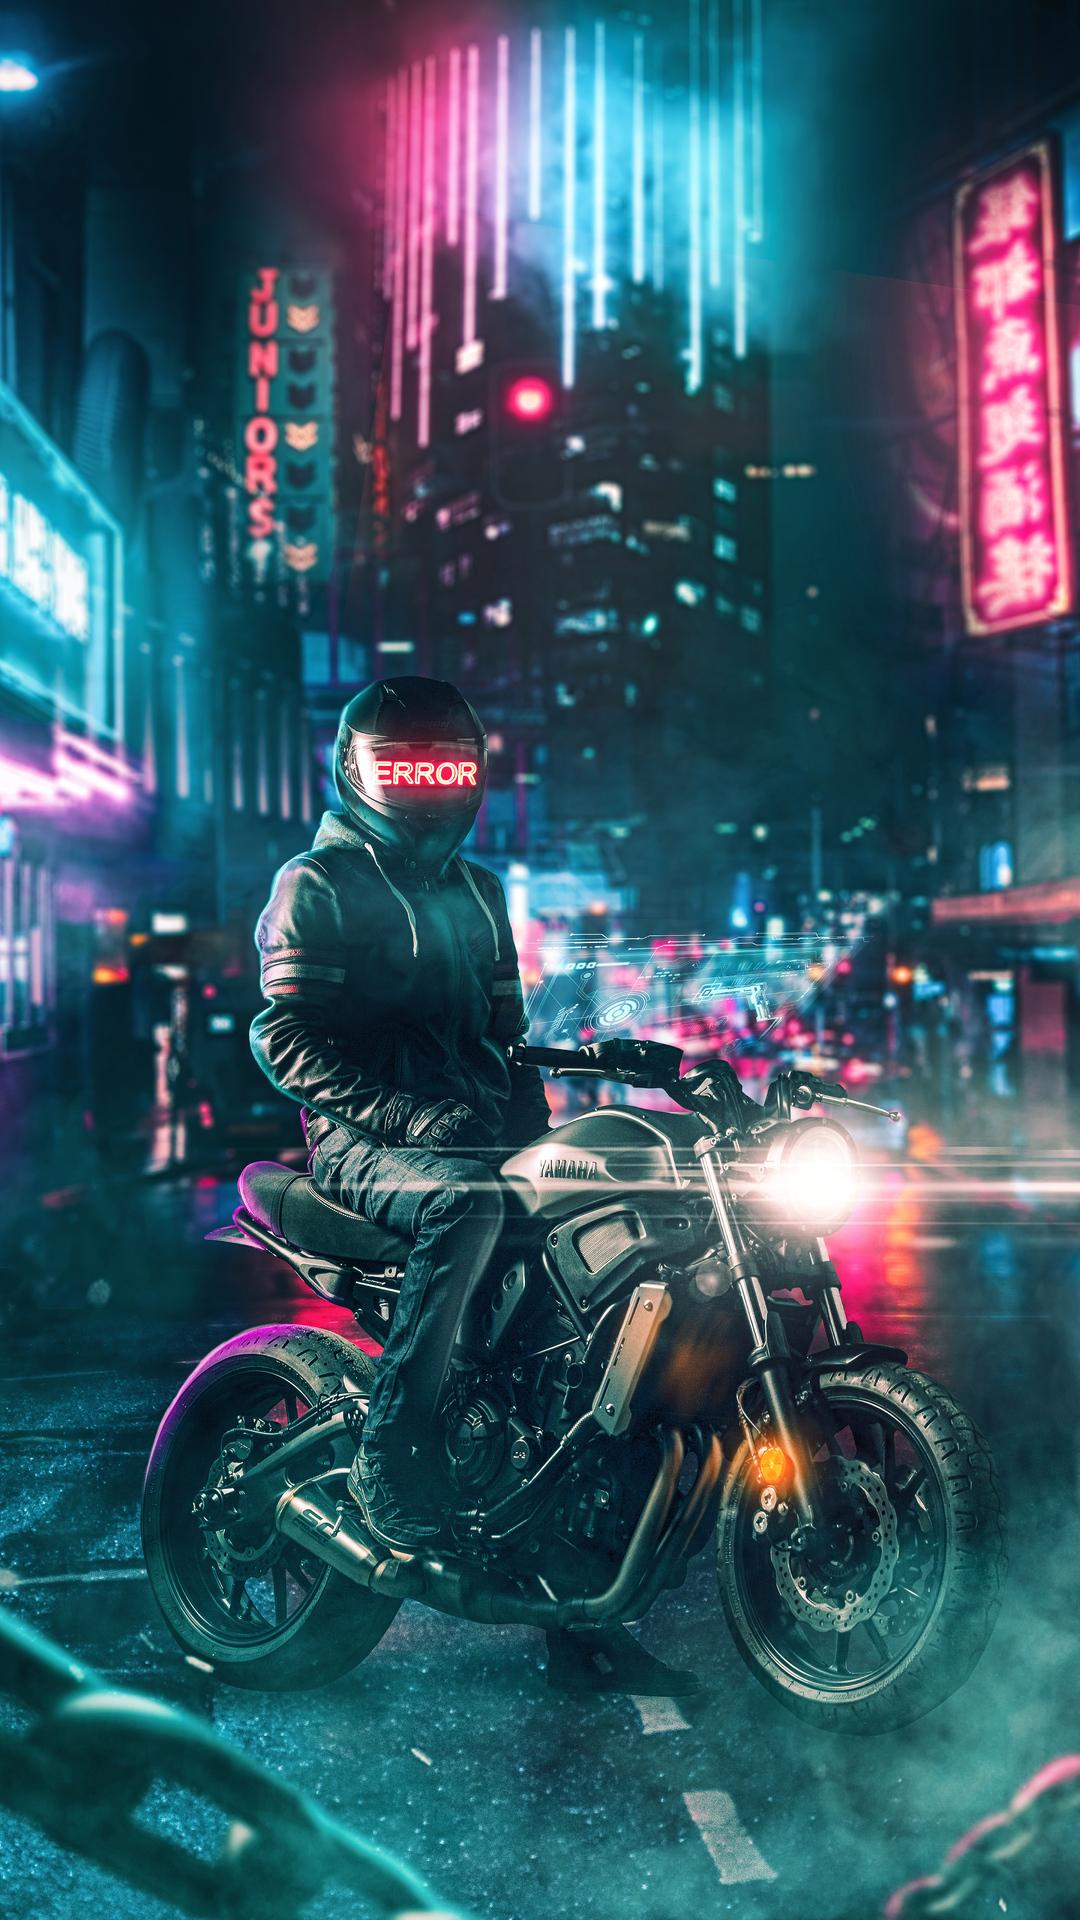 yamaha-rider-23.jpg